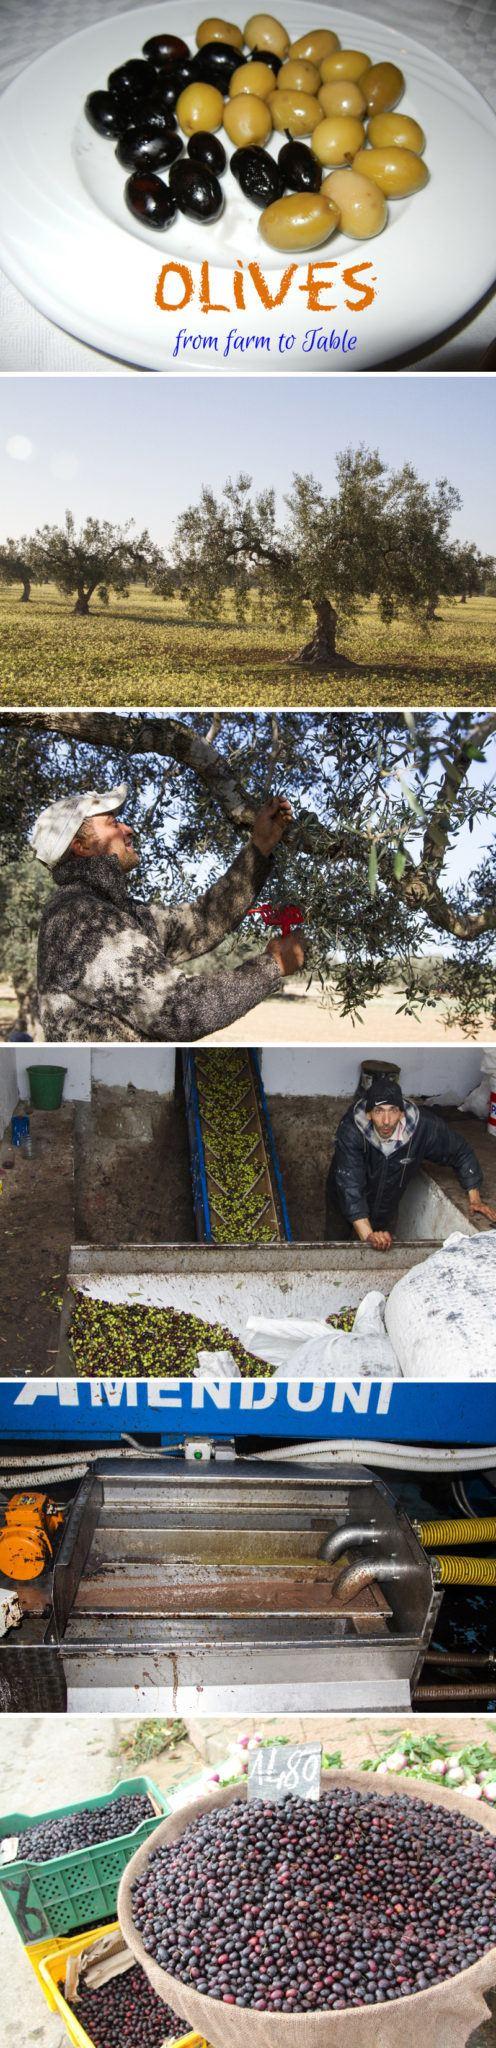 Tunisia Olives